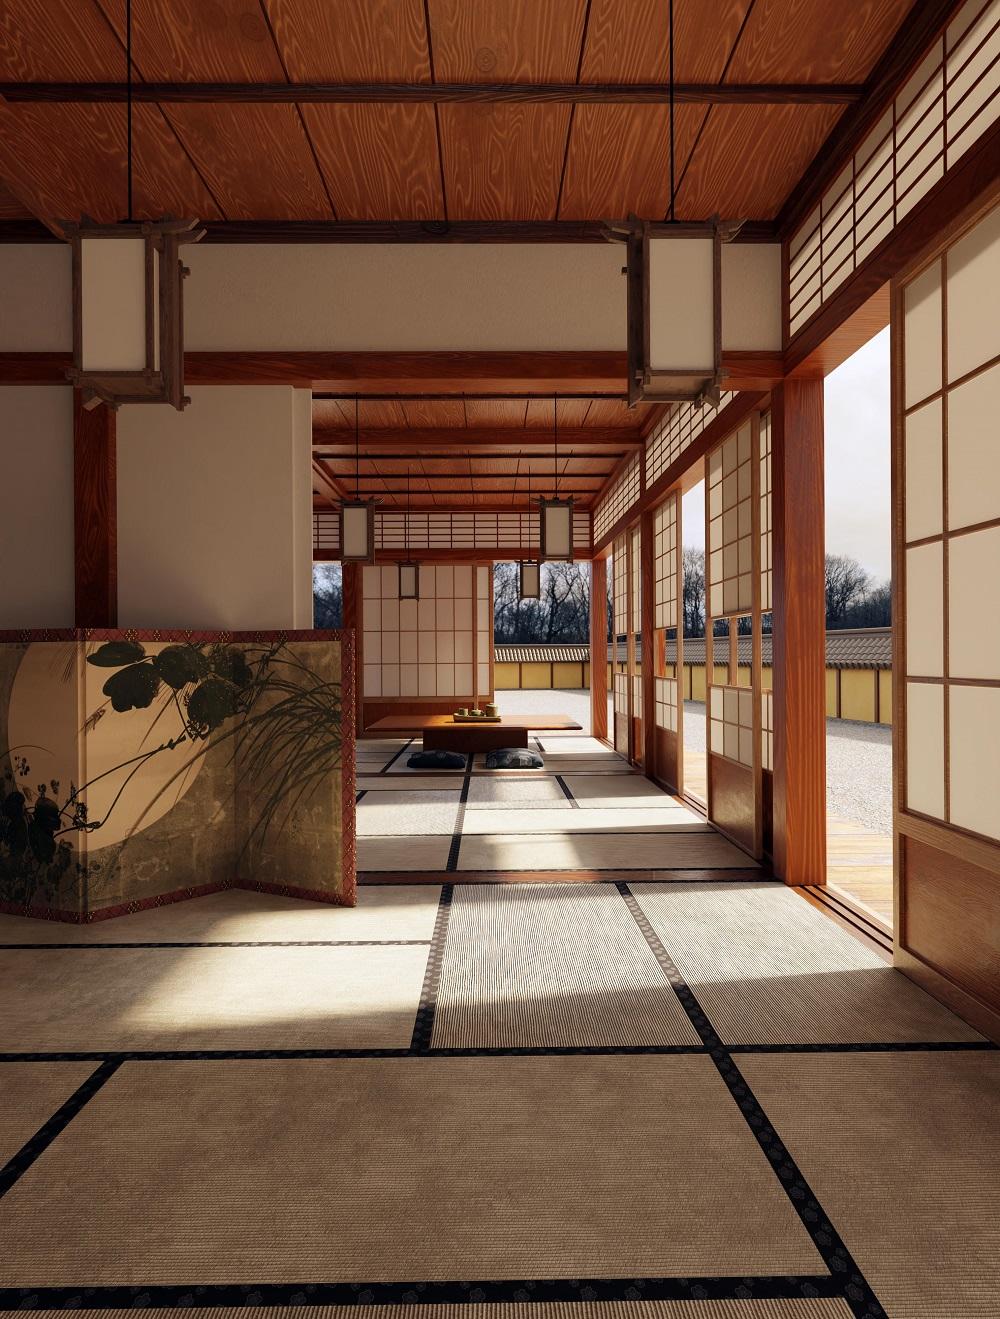 Japanese Zen interior | Source: blenderartists.org